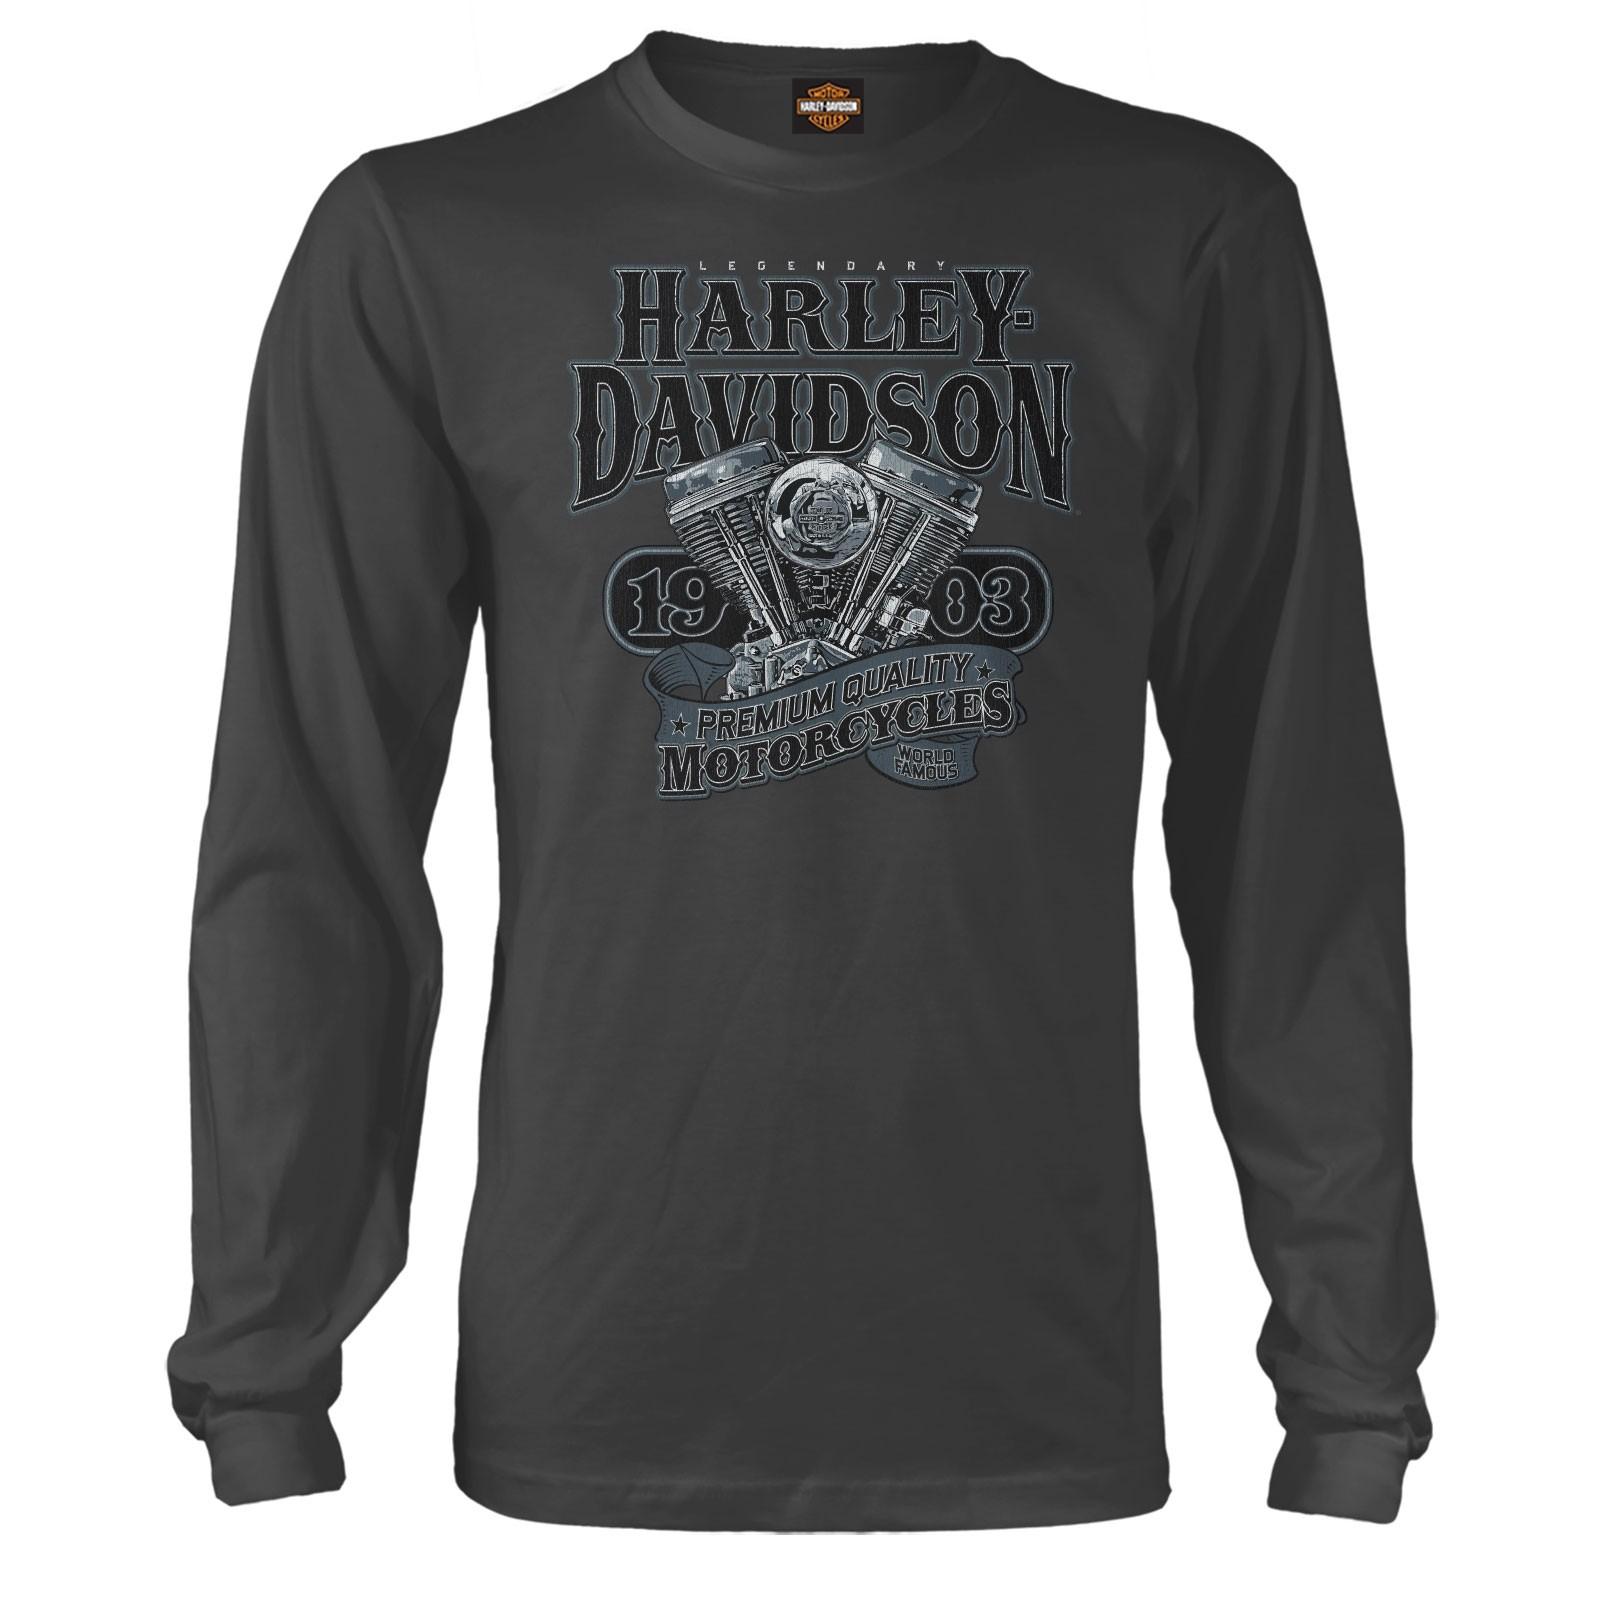 Harley-Davidson Men's Long-Sleeve Graphic T-shirt - Overseas Tour | Big V-Twin